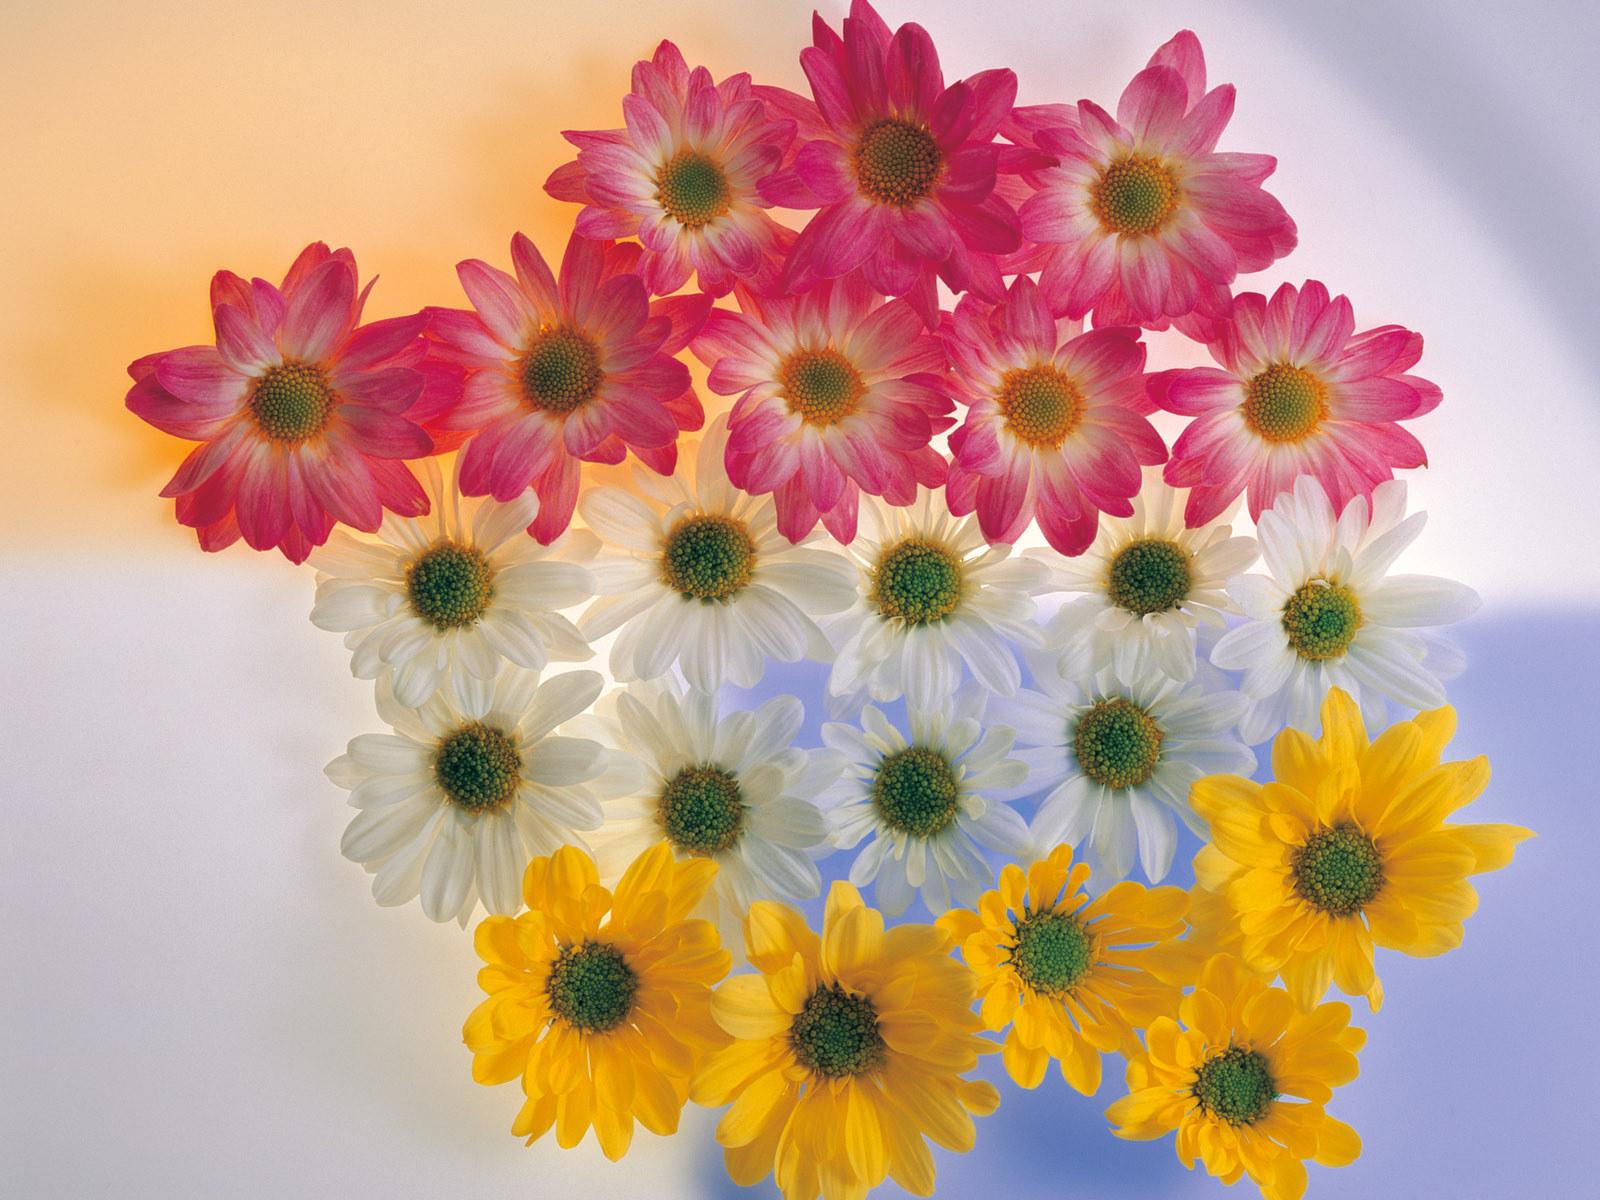 60 Best Flowers Hd Images Flowers Flower Wallpaper Beautiful Flowers